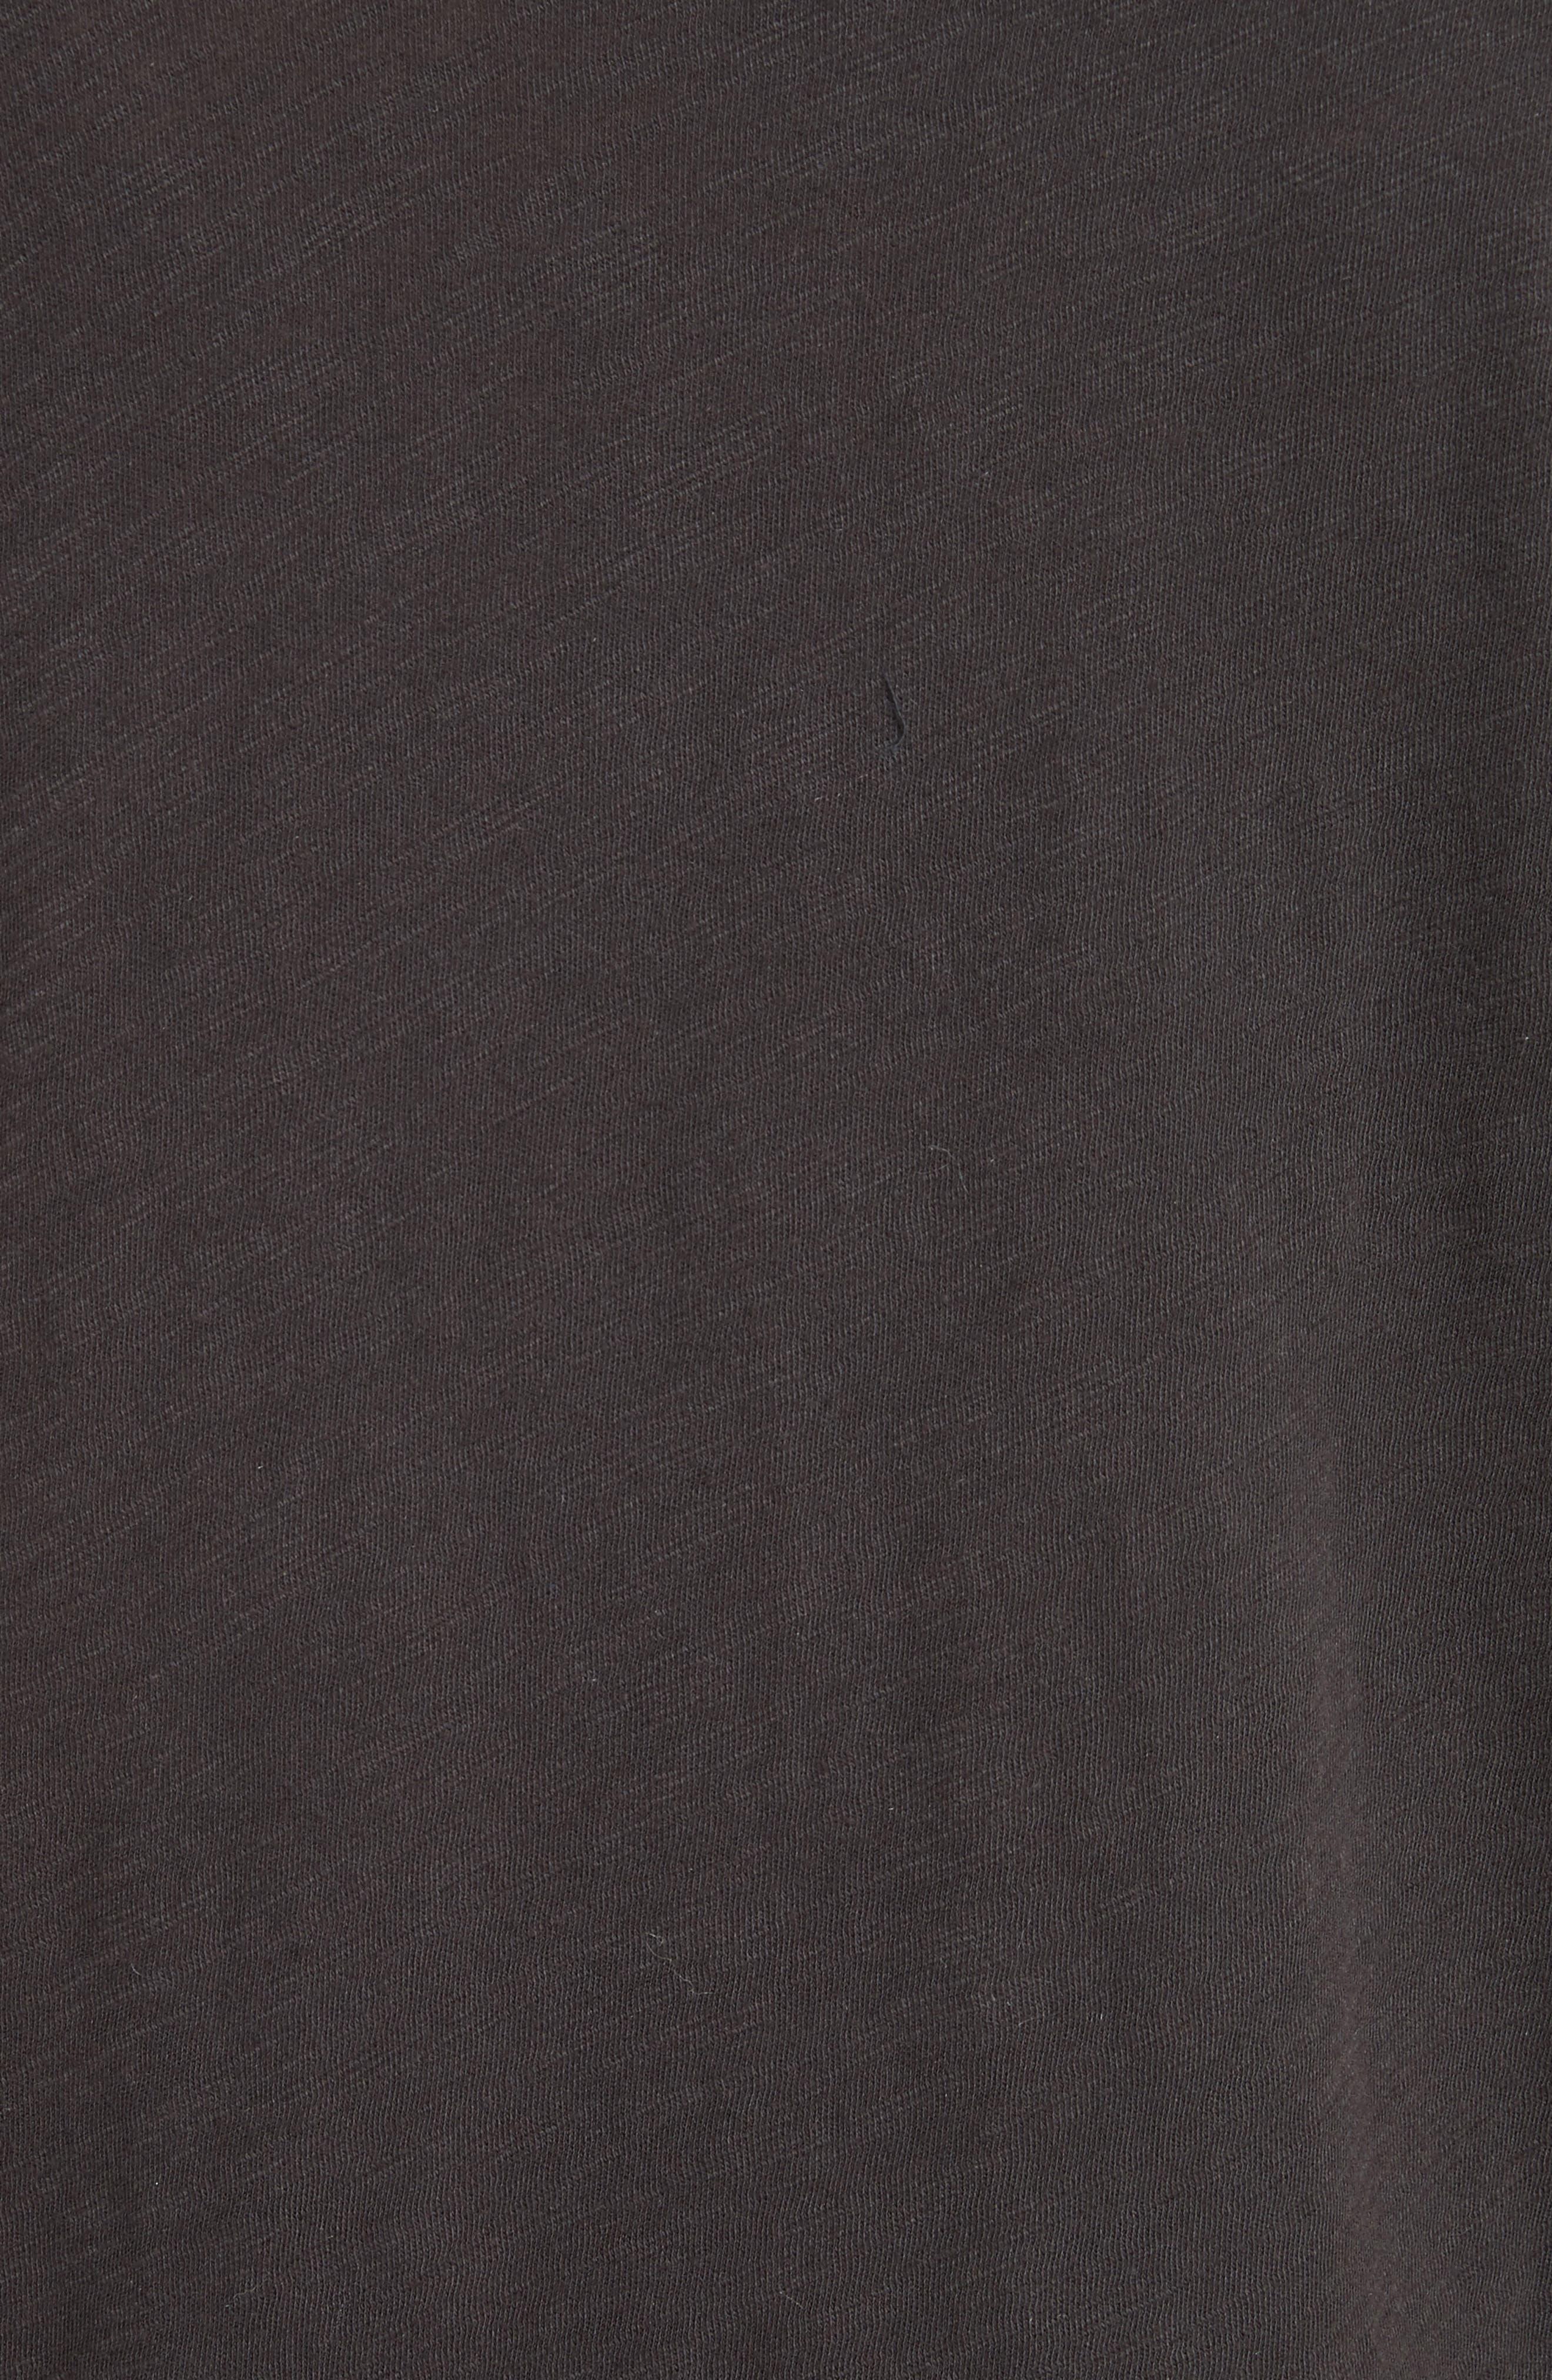 New York T-Shirt,                             Alternate thumbnail 5, color,                             001